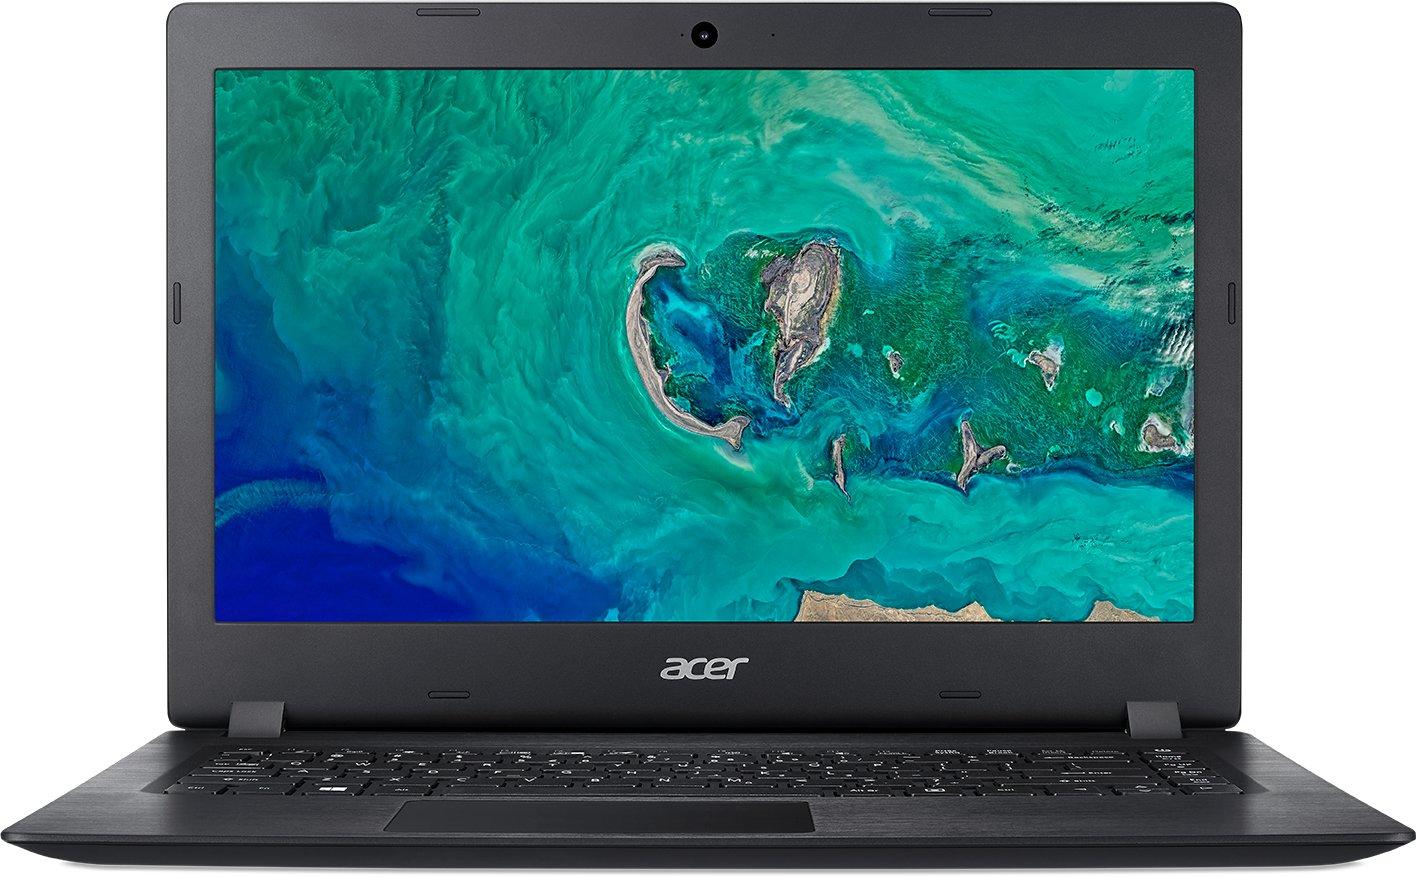 Acer Aspire 1 - 14''/N4100/4G/64GB/W10S černý + Office 365 Personal